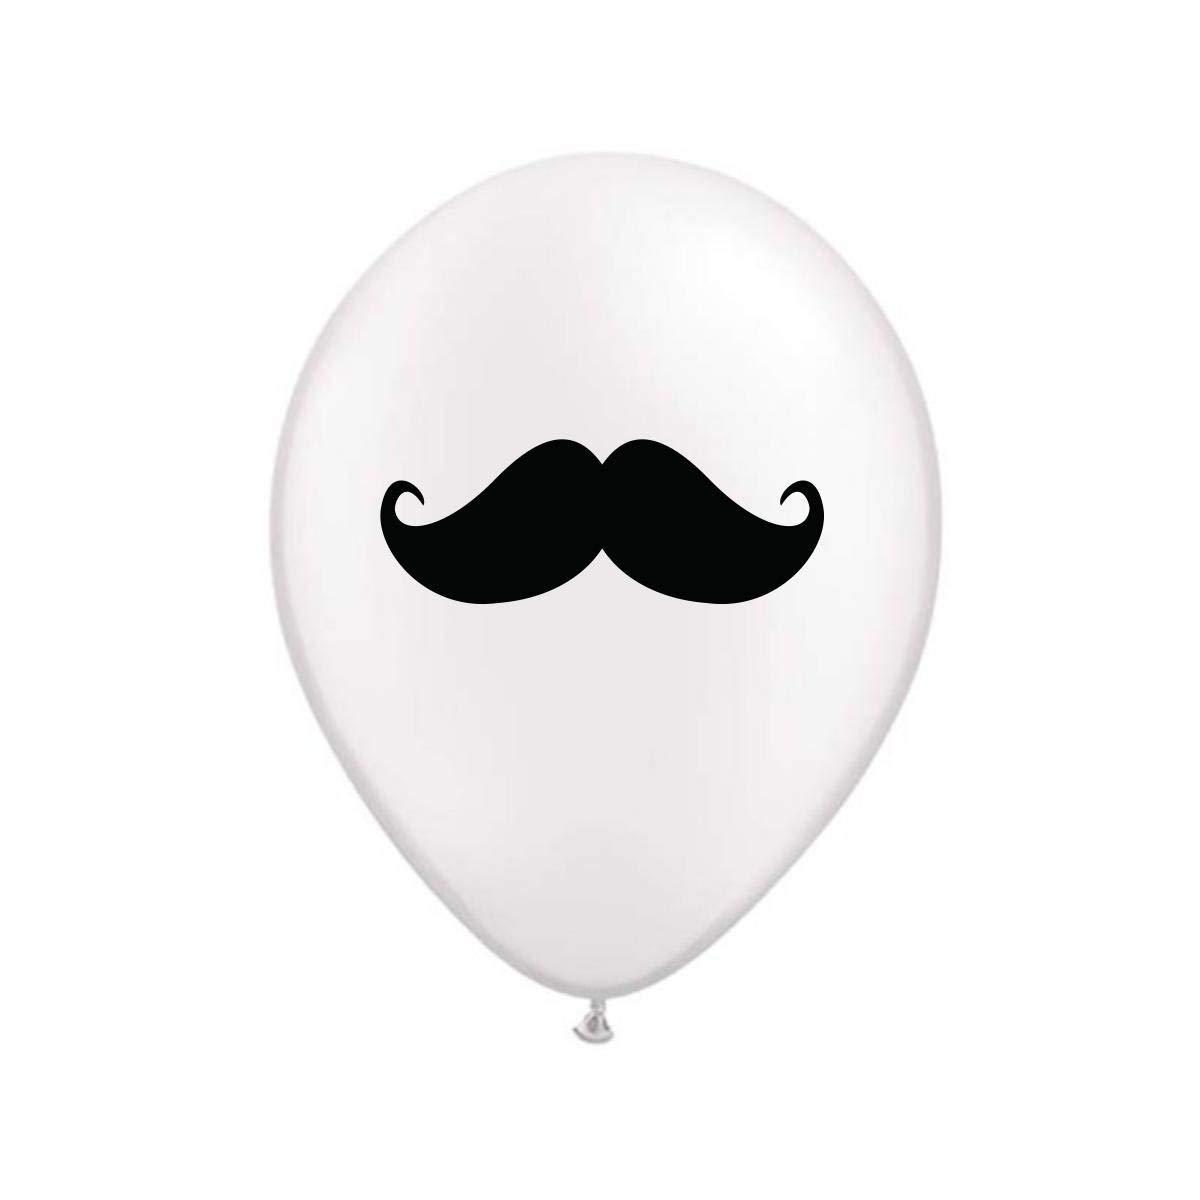 White Mustache Balloon Little Man Birthday Party Decorations Balloons